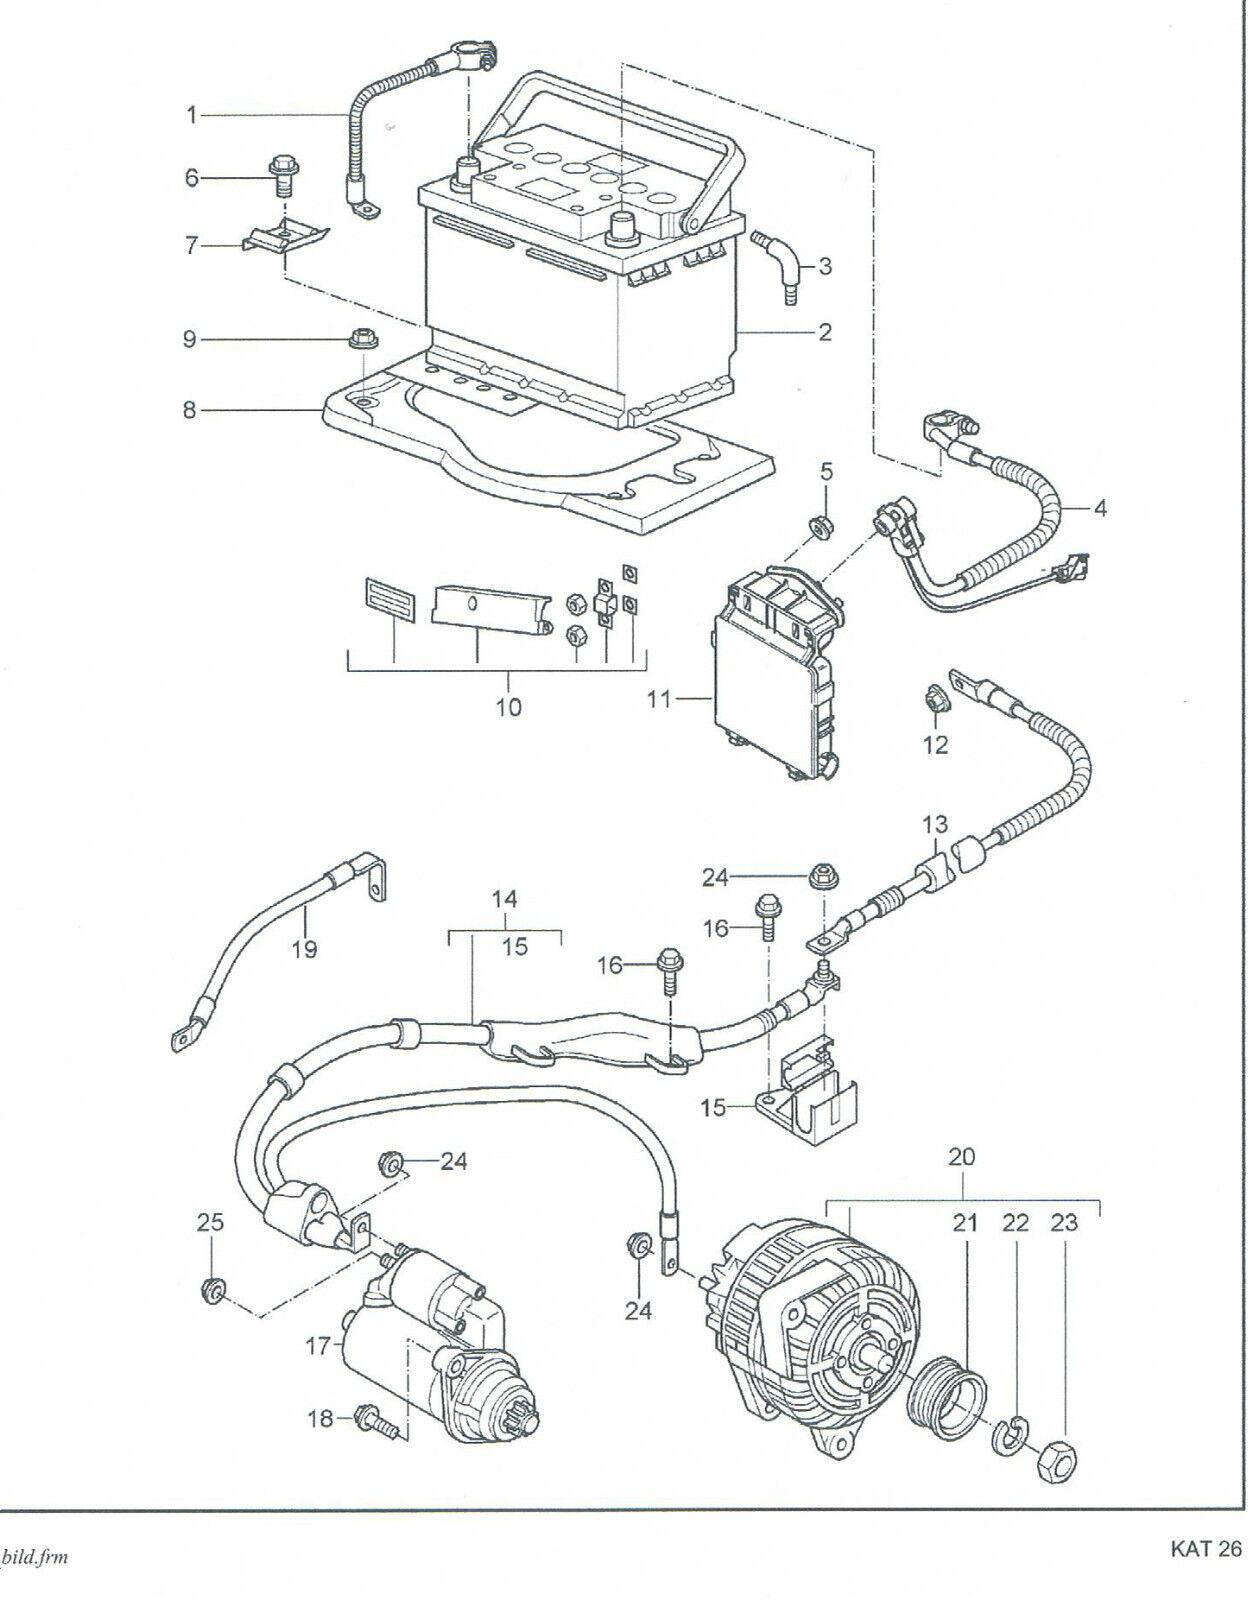 Porsche 997 Alternator Starter Motor Wiring Harness Manual Remote Diagram Norton Secured Powered By Verisign